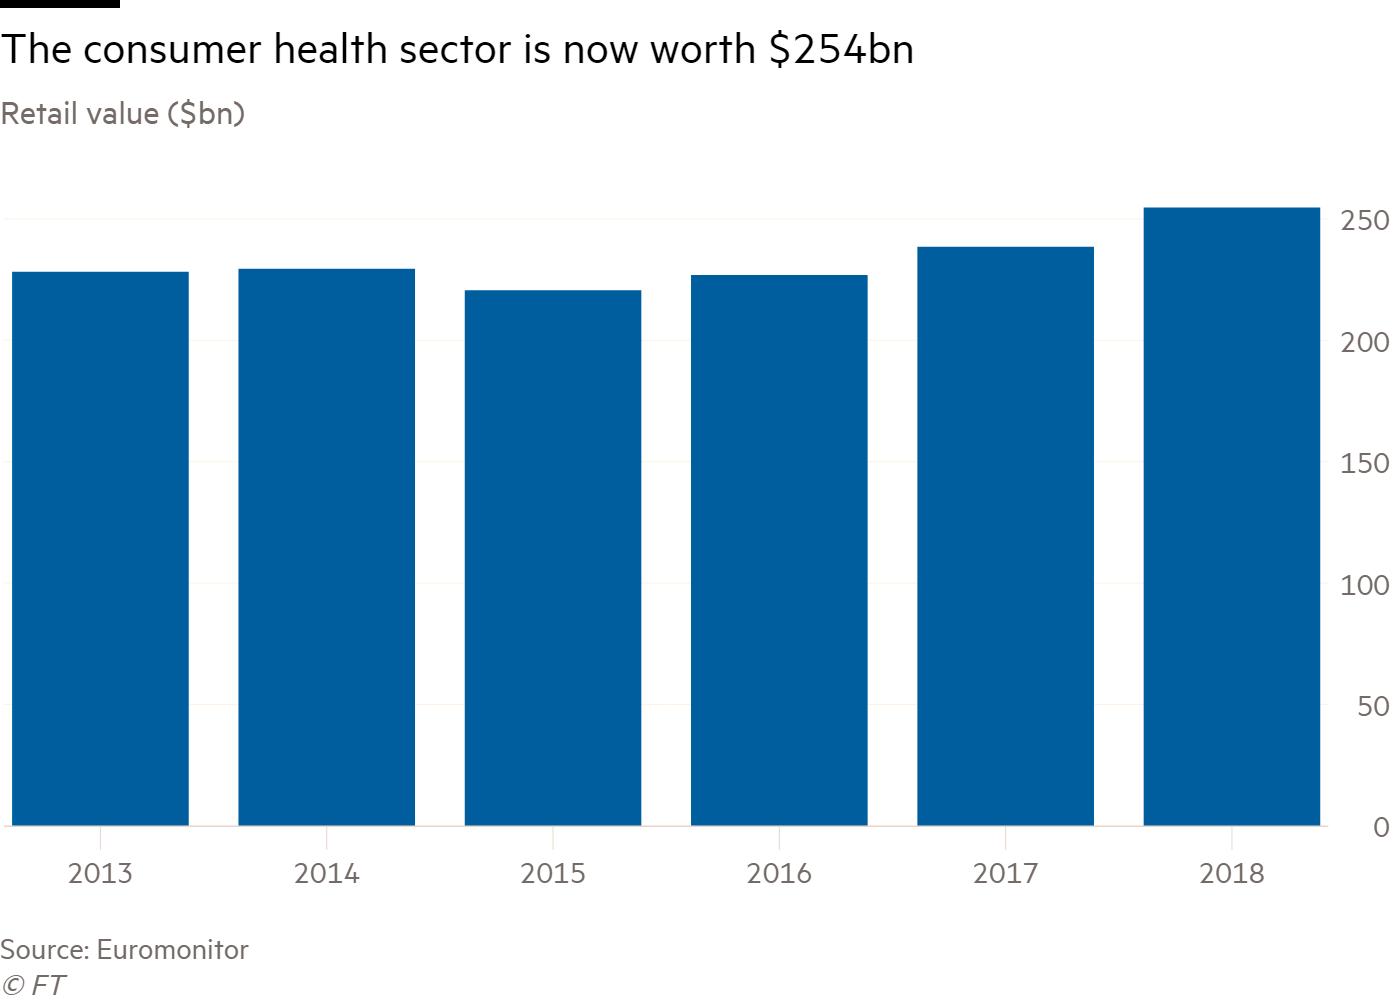 consumer health sector worth - GlaxoSmithKline и Pfizer объединят потребительские и безрецептурные бизнесы